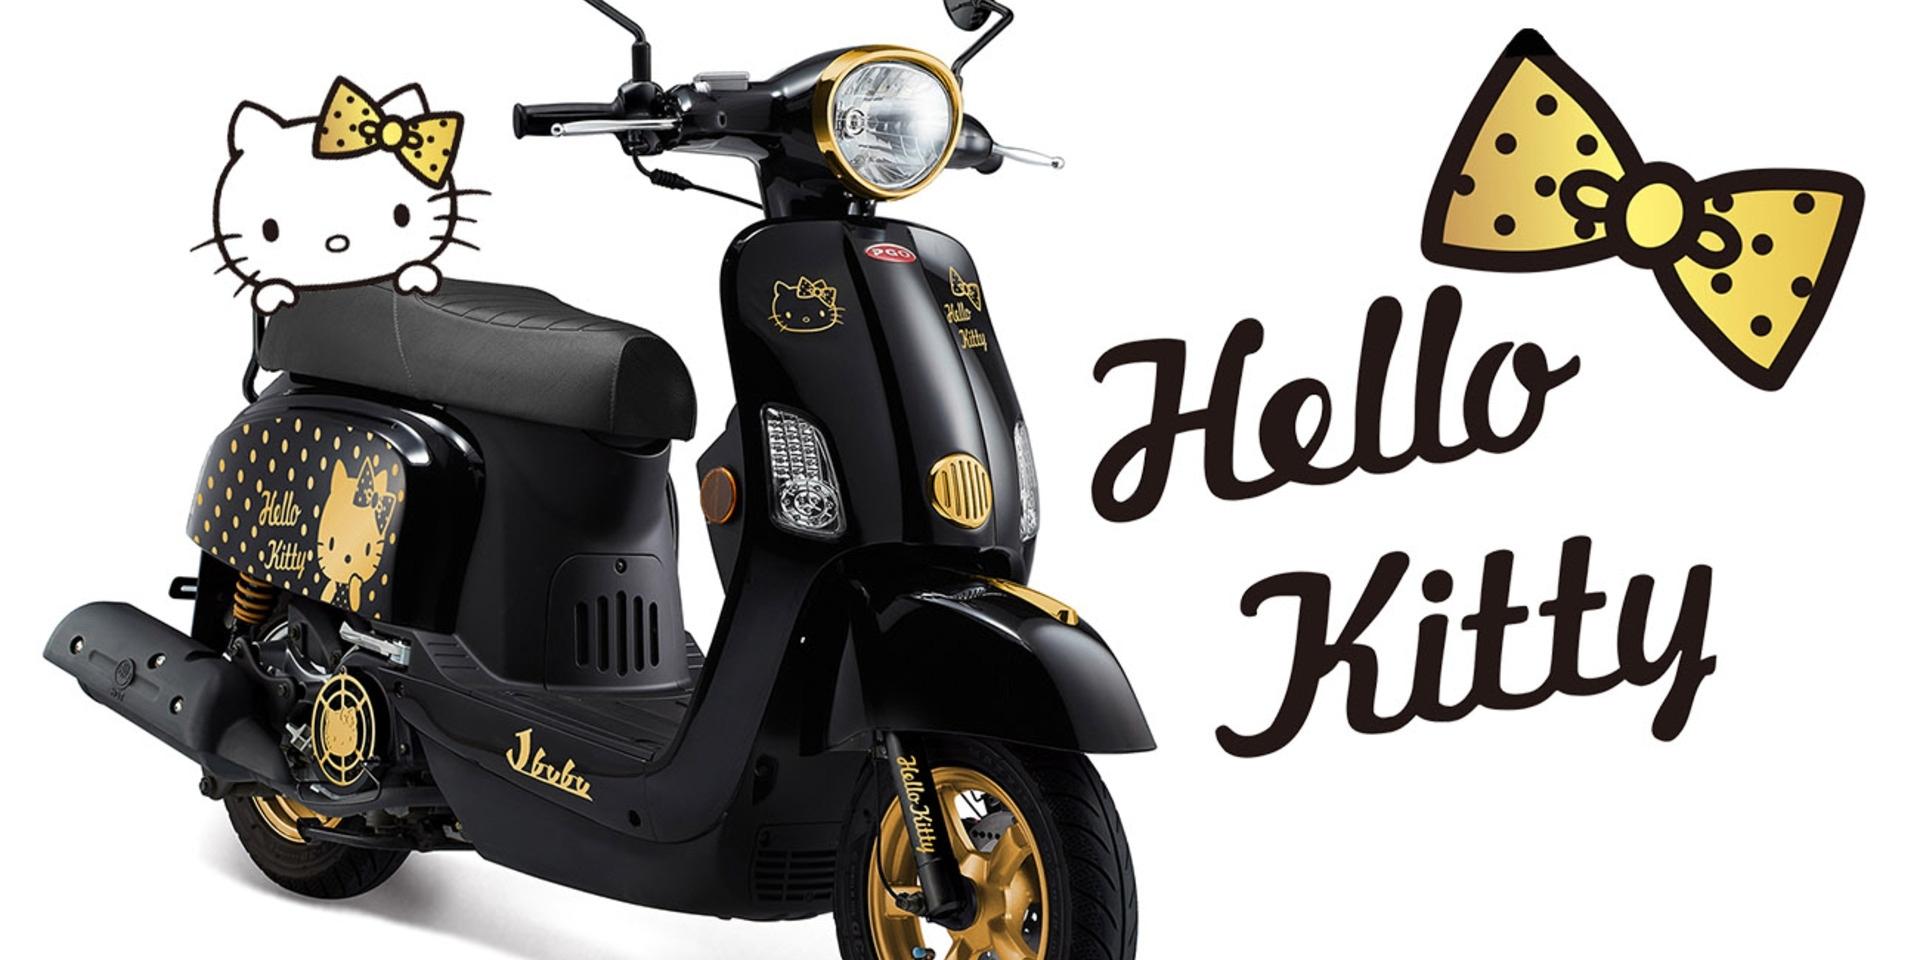 HELLO KITTY J-BUBU  1314台 限量發售